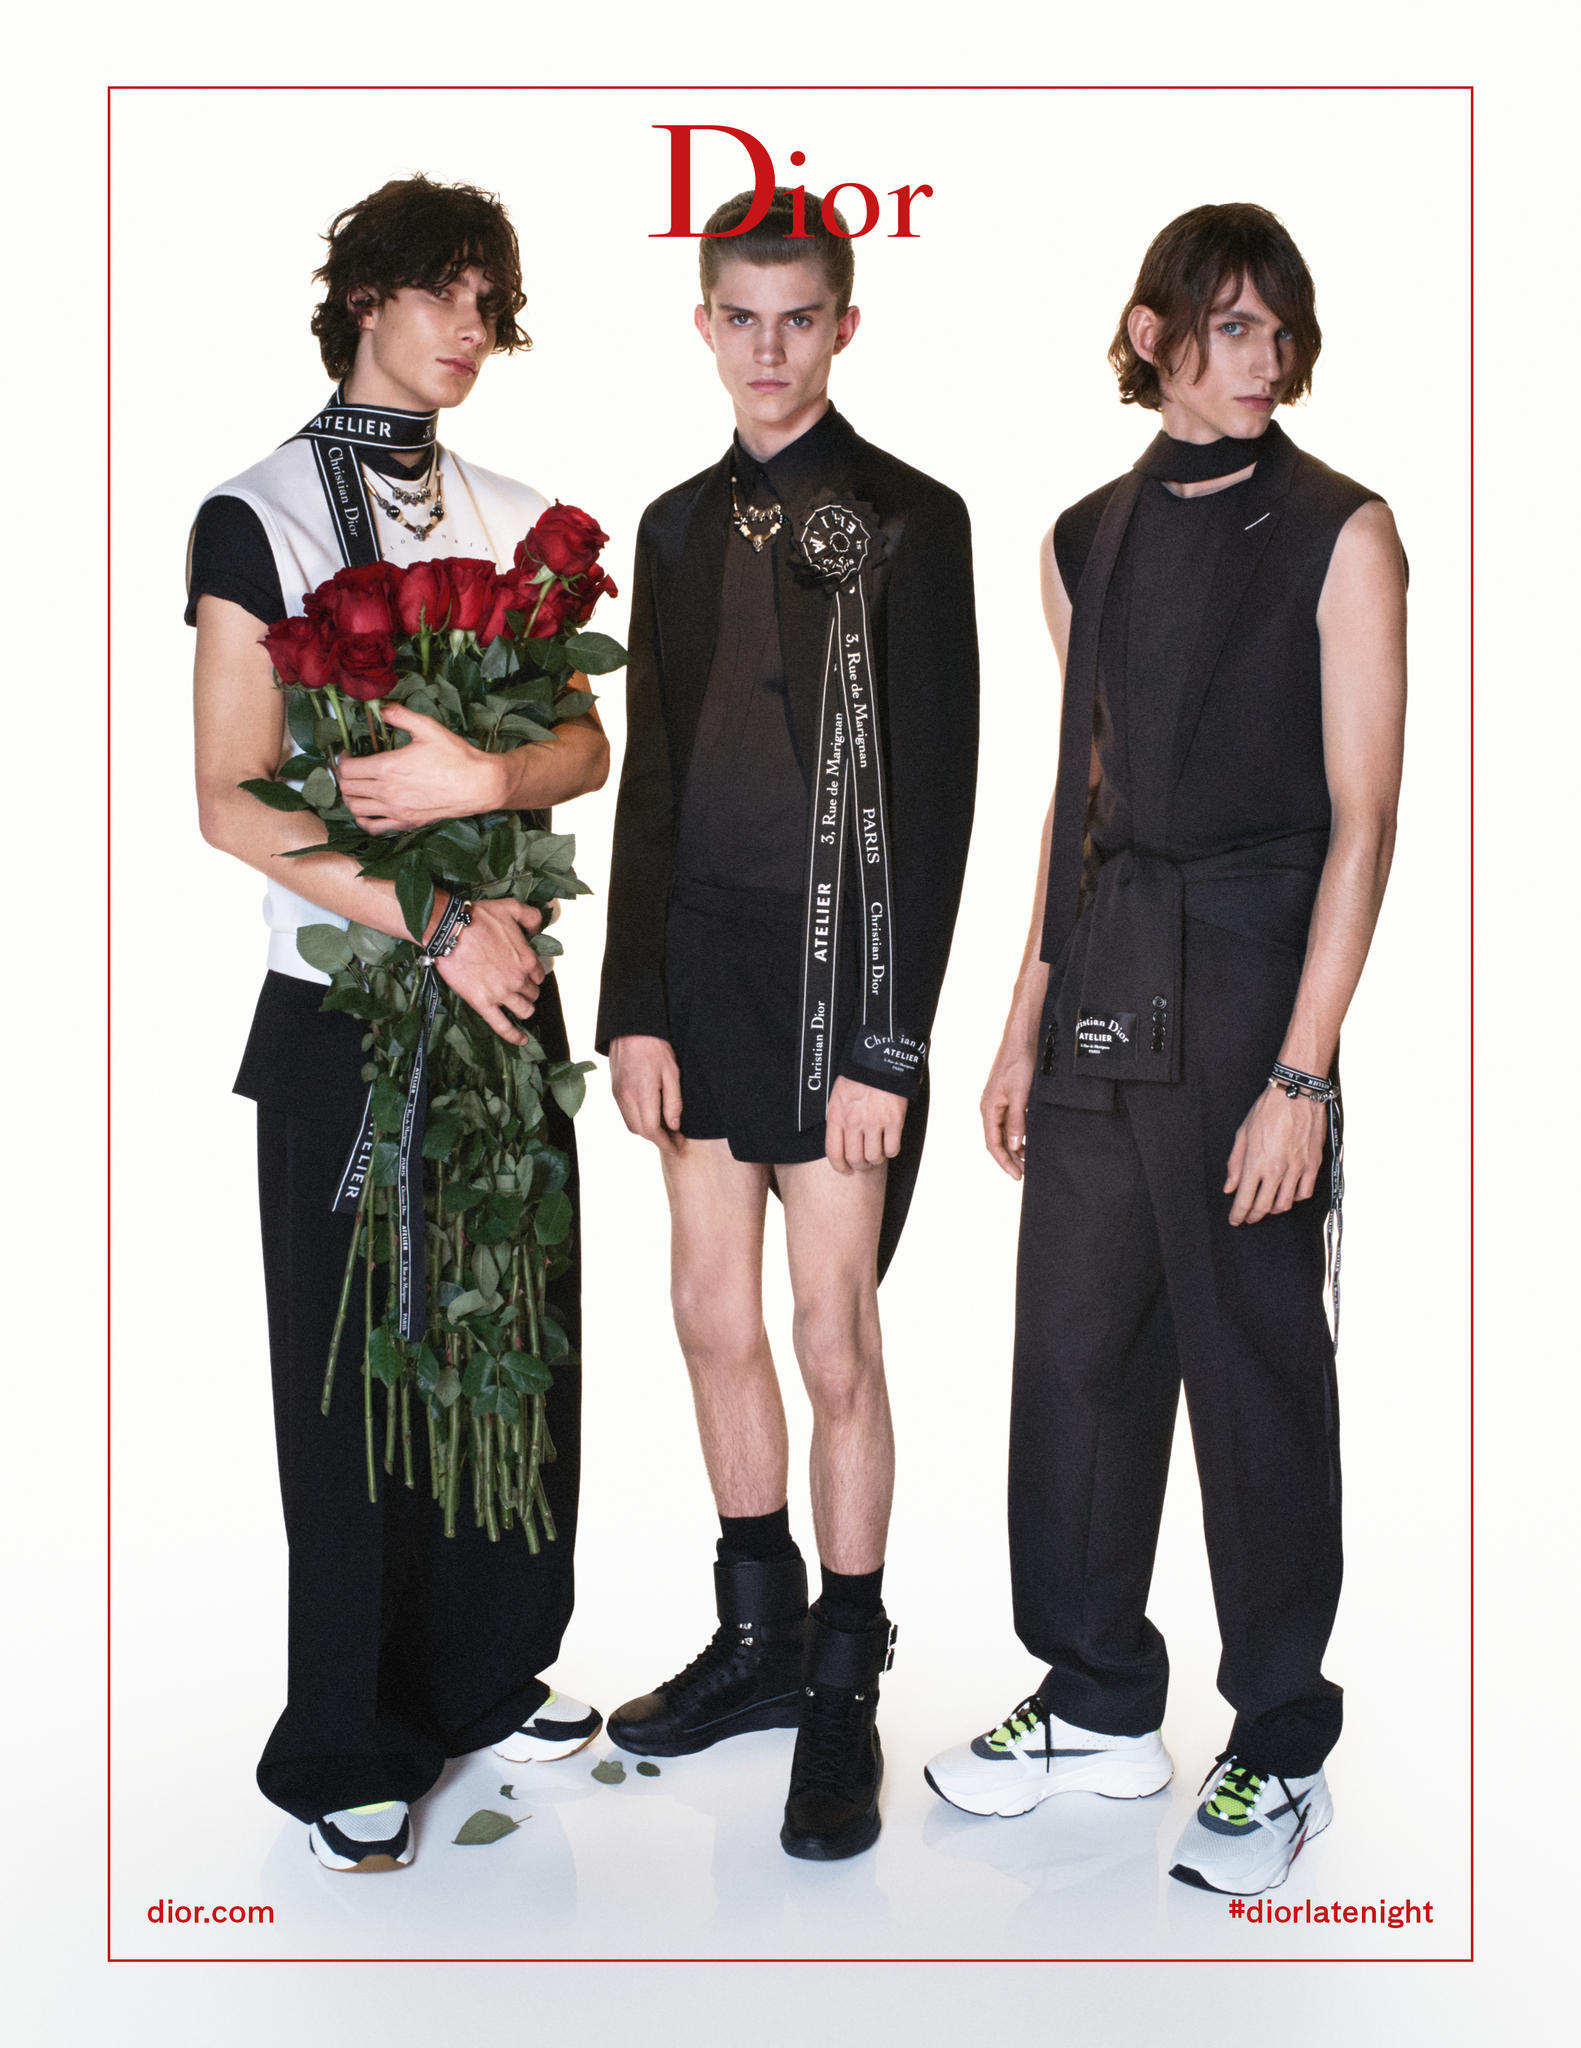 c4ebe793d07 Dior Homme - Art Partner